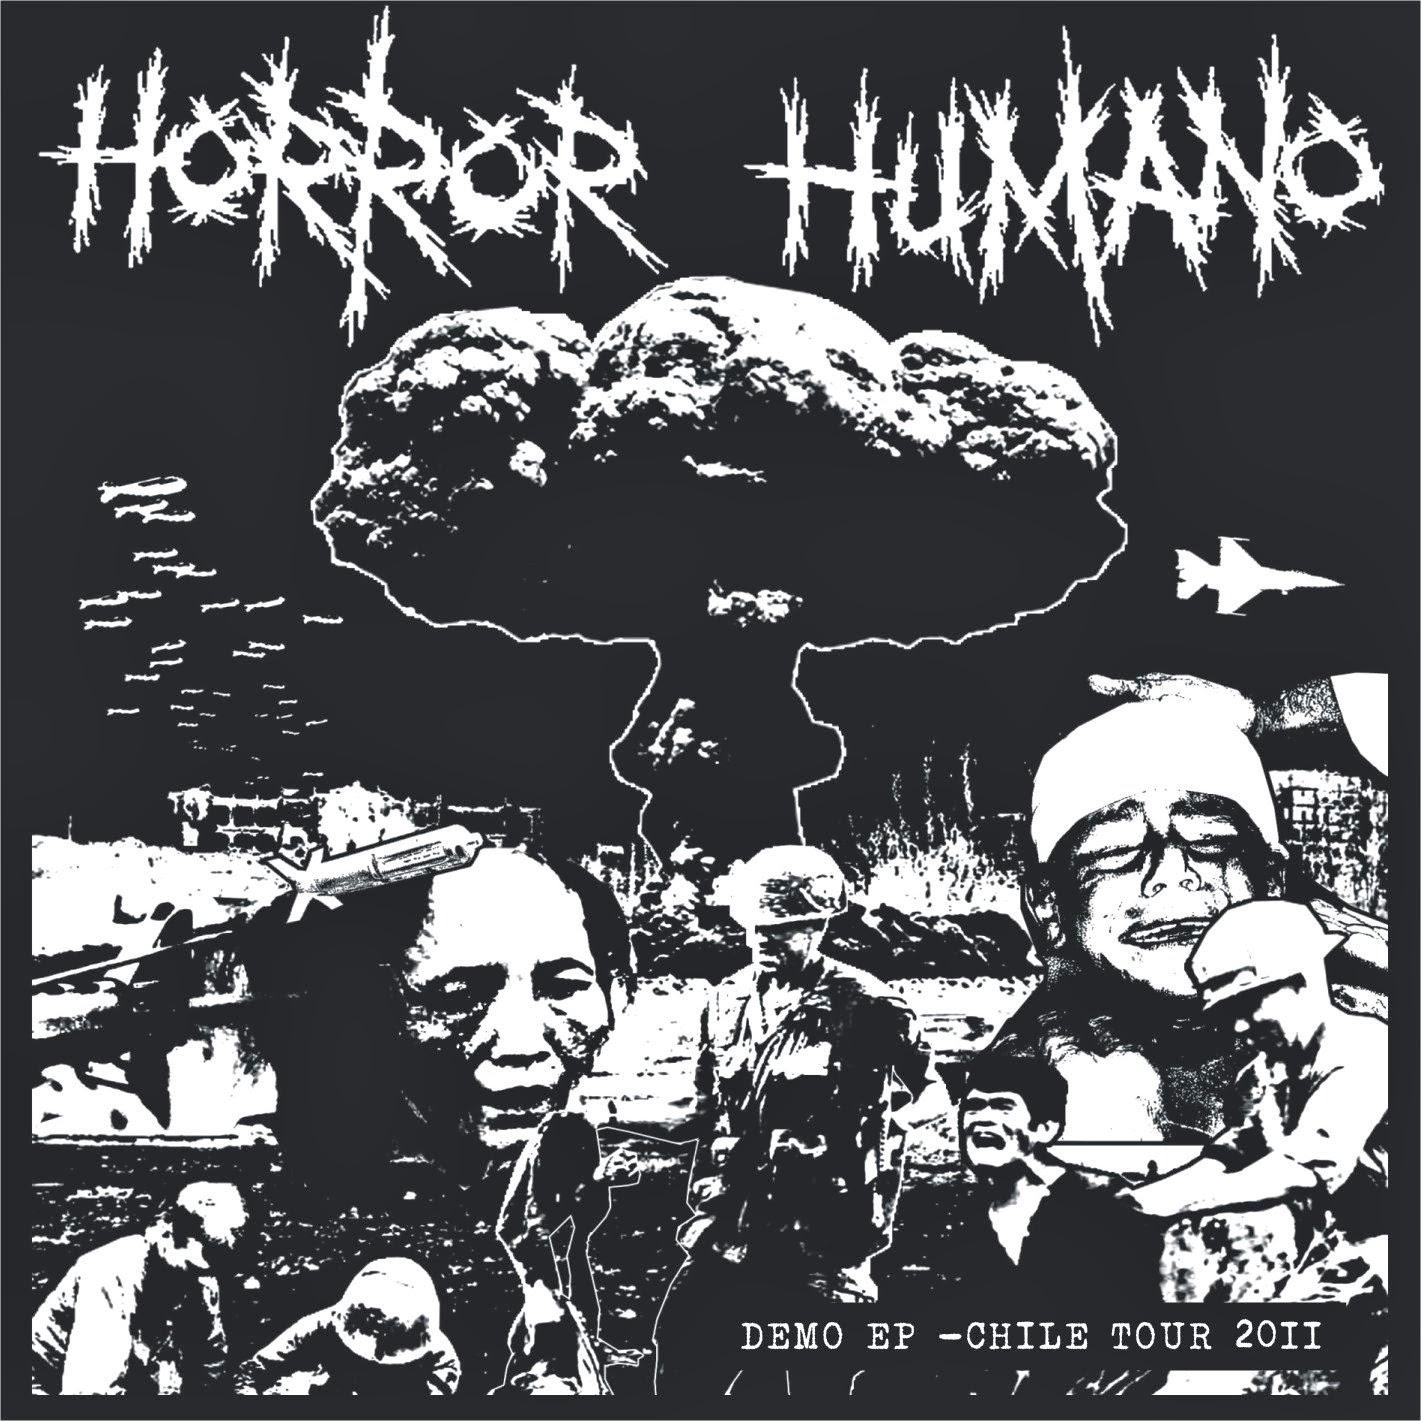 Metal Brutal Argentino 1 01 14 Tendencies Kaos Golden Sabotage Hitam Xxl Horror Humano Demo Ep Chile Tour 2011